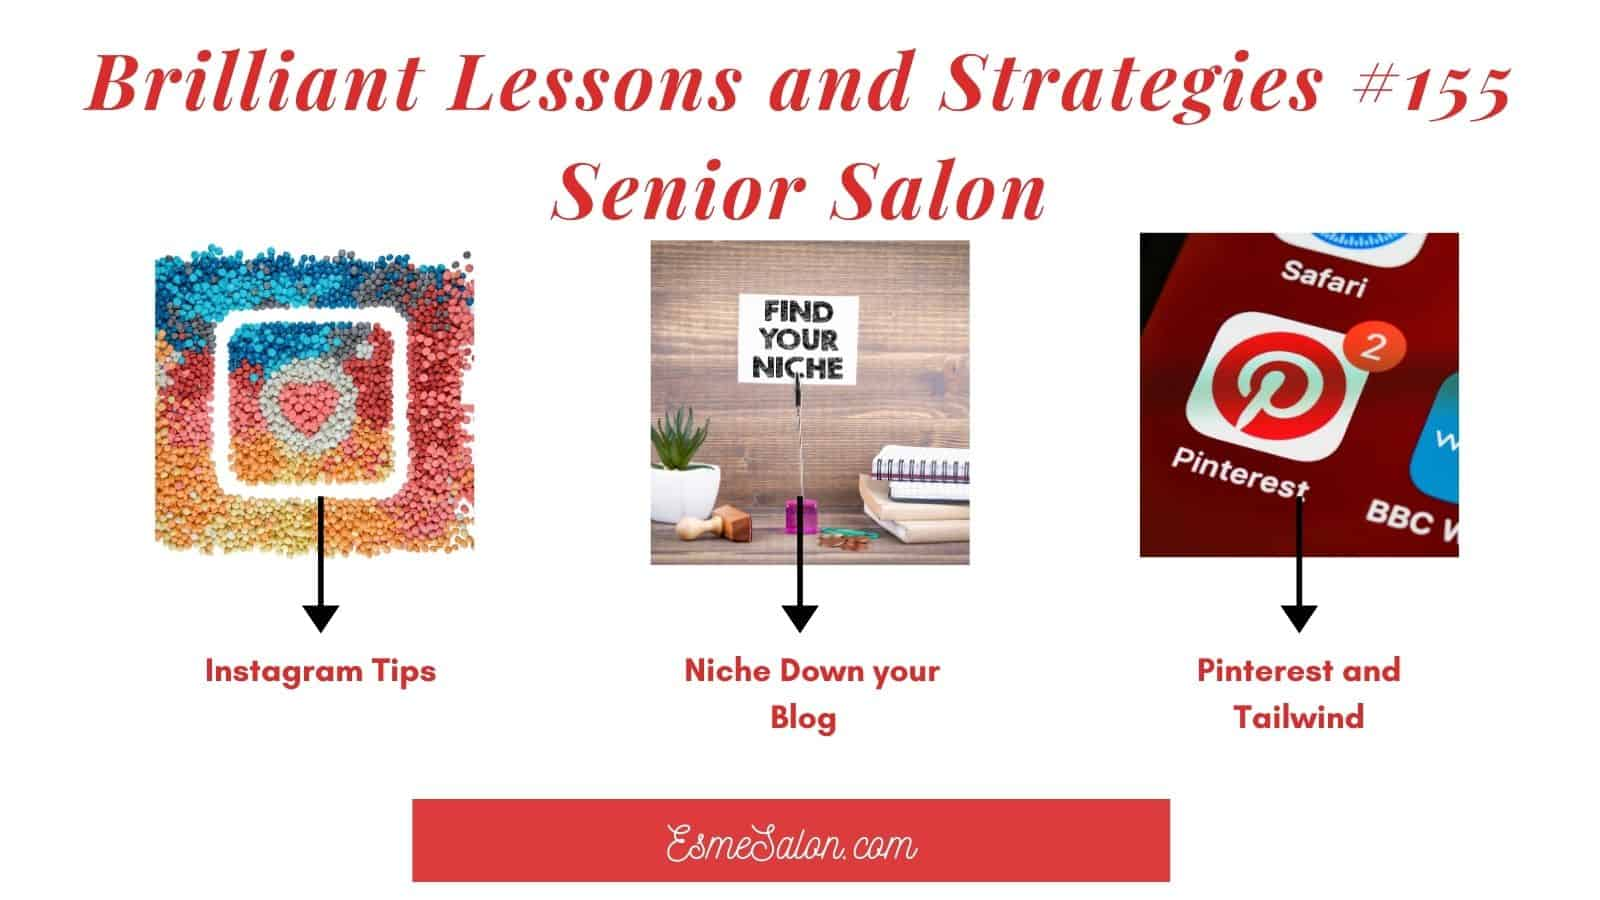 Brilliant Lessons and Strategies #155 Senior Salon